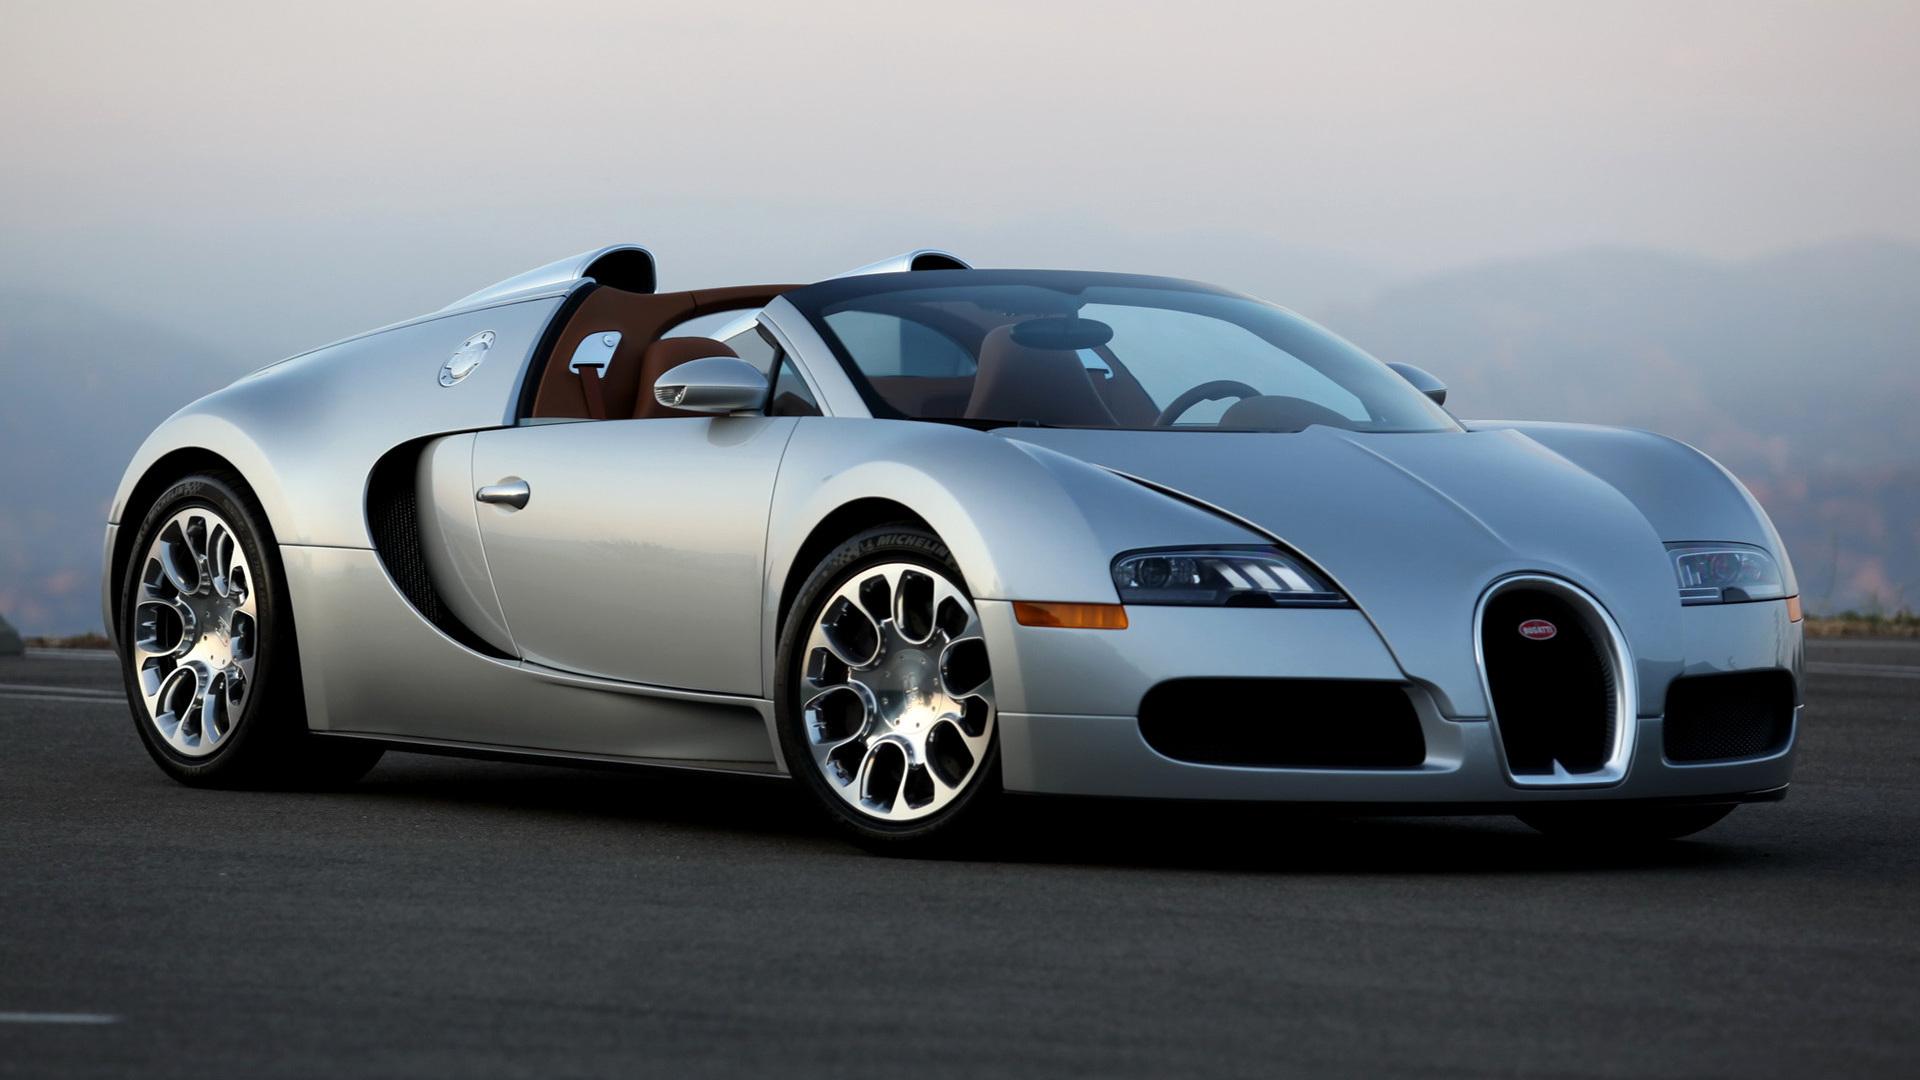 Wallpaper Bugatti Veyron Grand Sport: Bugatti Veyron Grand Sport (2009) US Wallpapers And HD